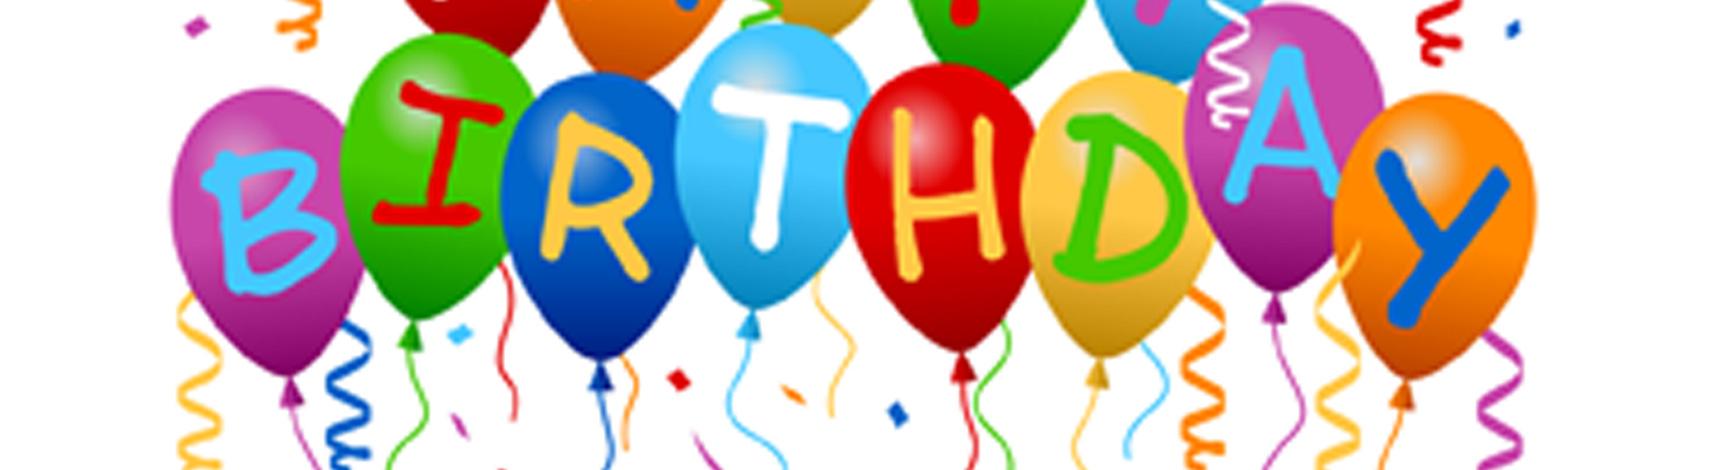 Happy birthday balloons helium air and boxedflowers auckland izmirmasajfo